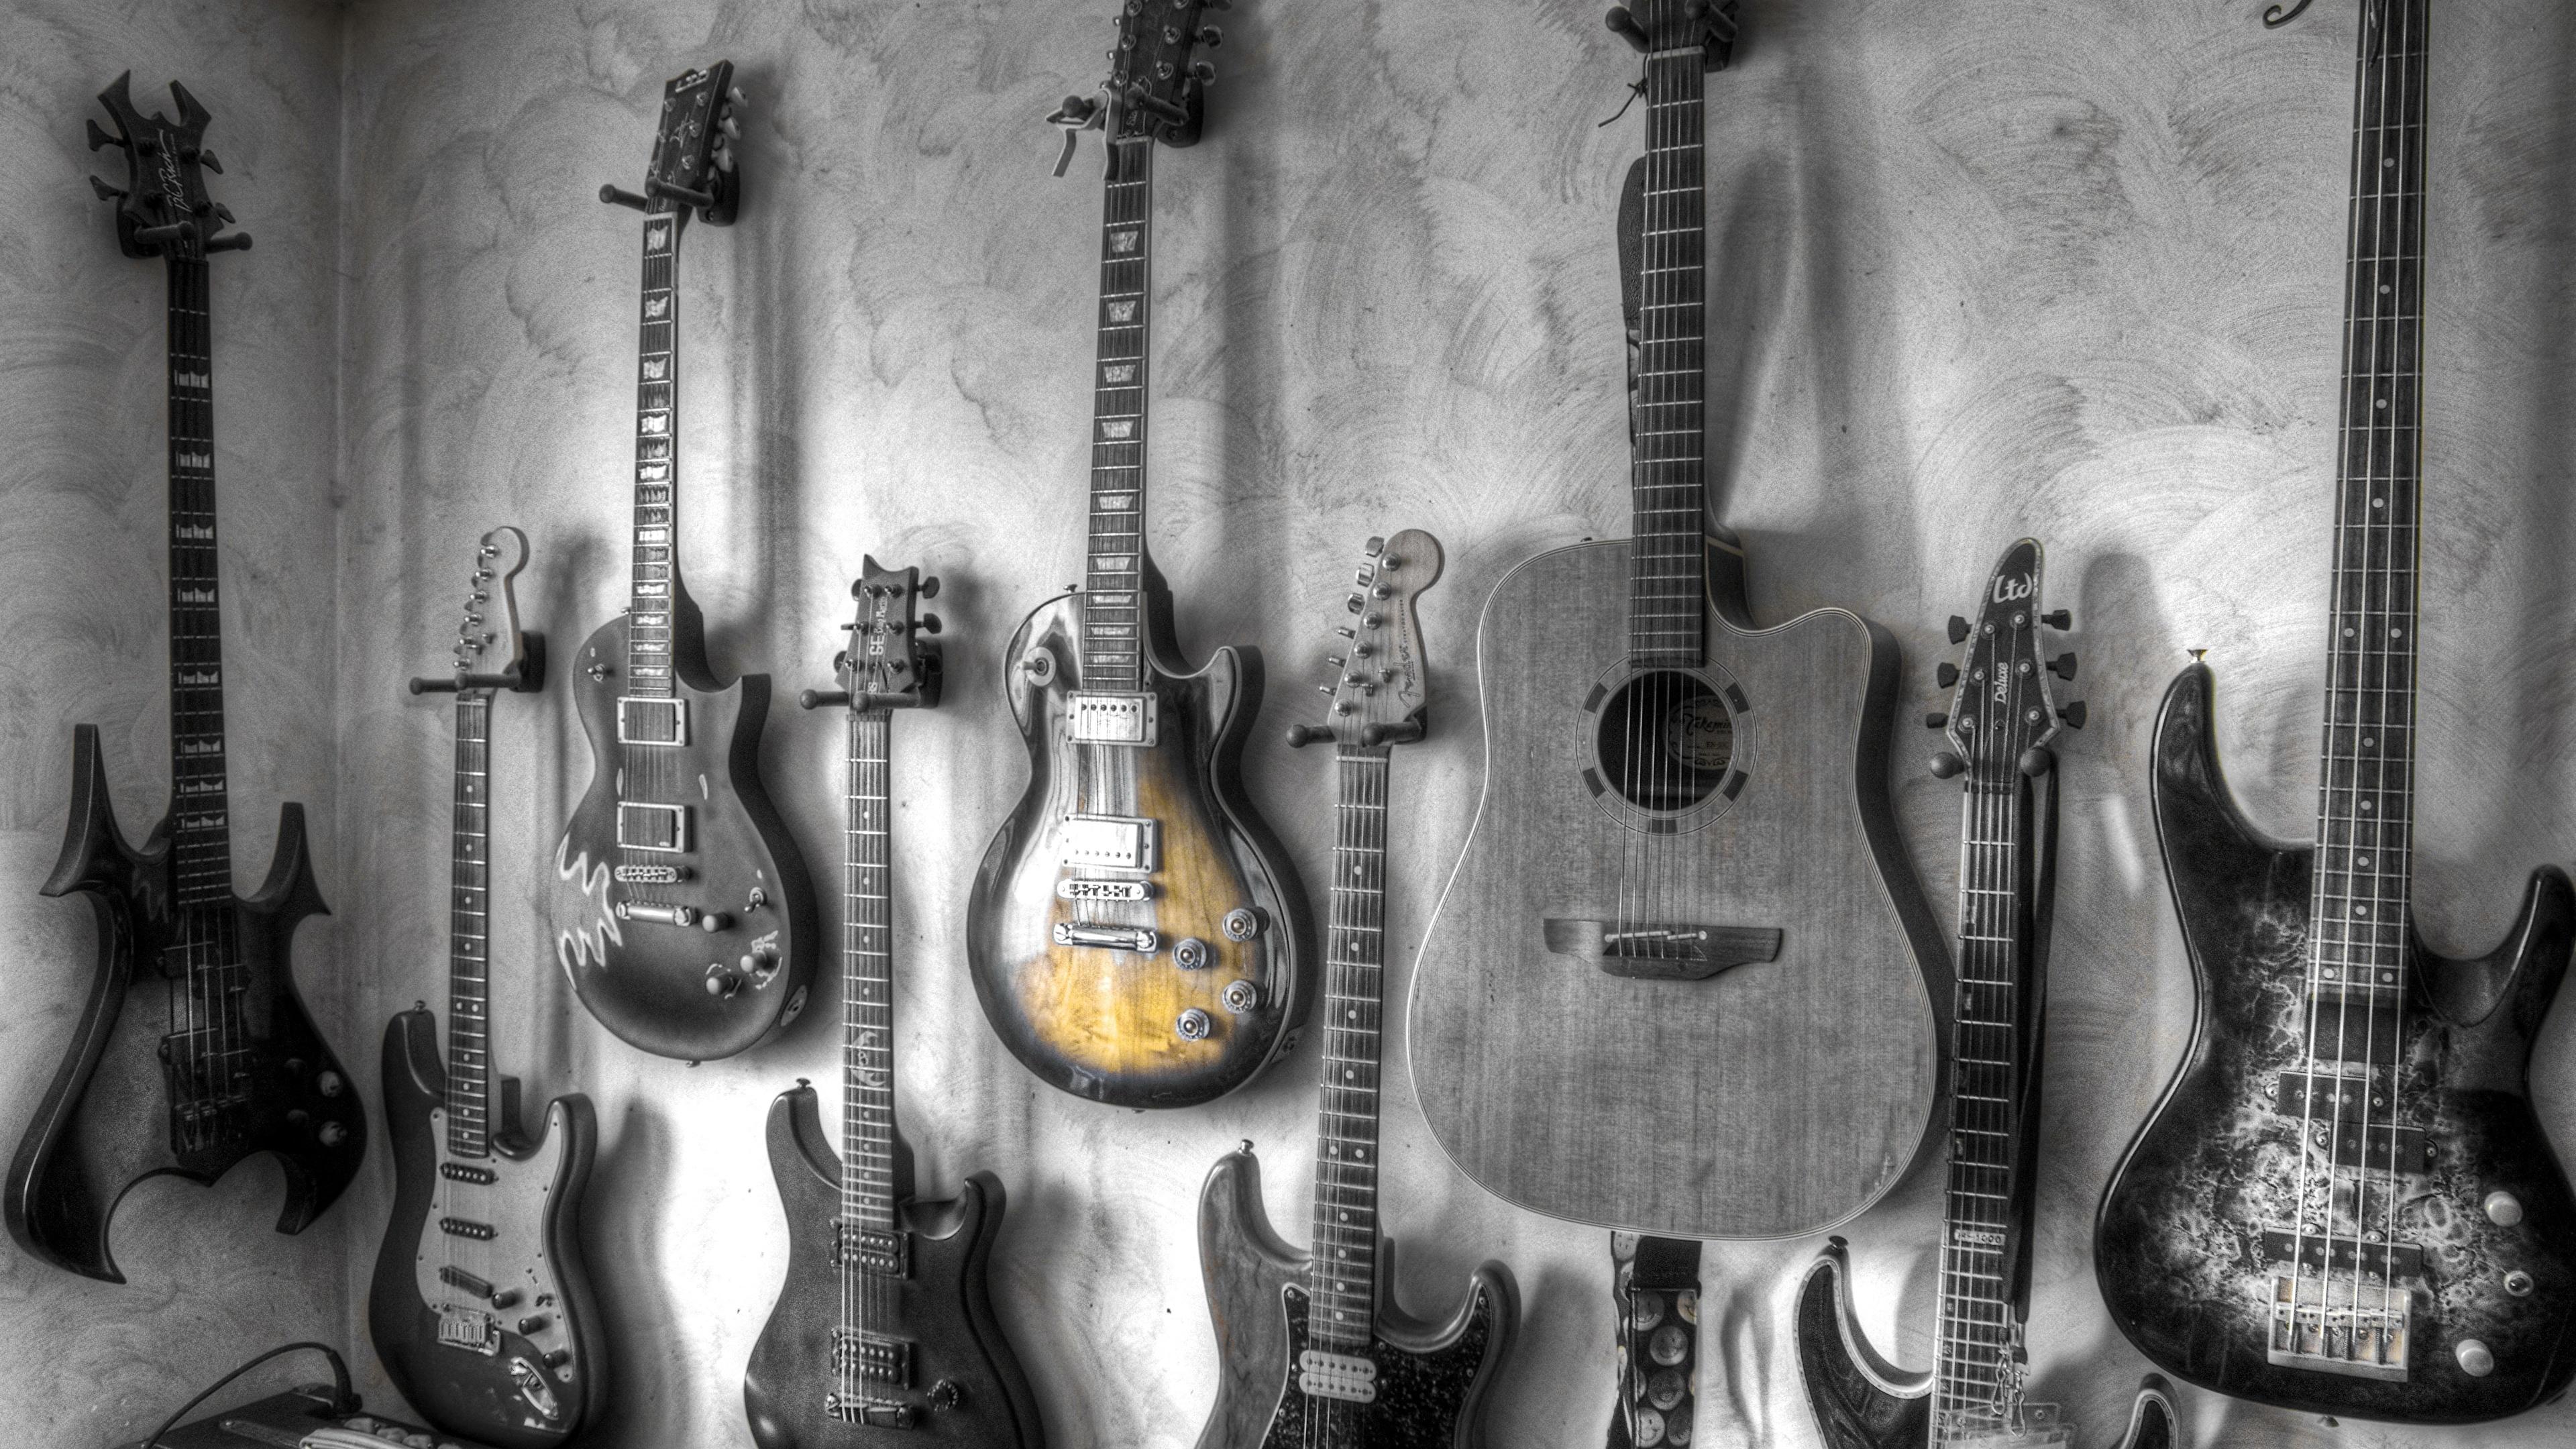 Photos Guitar Music Wall Black And White 3840x2160